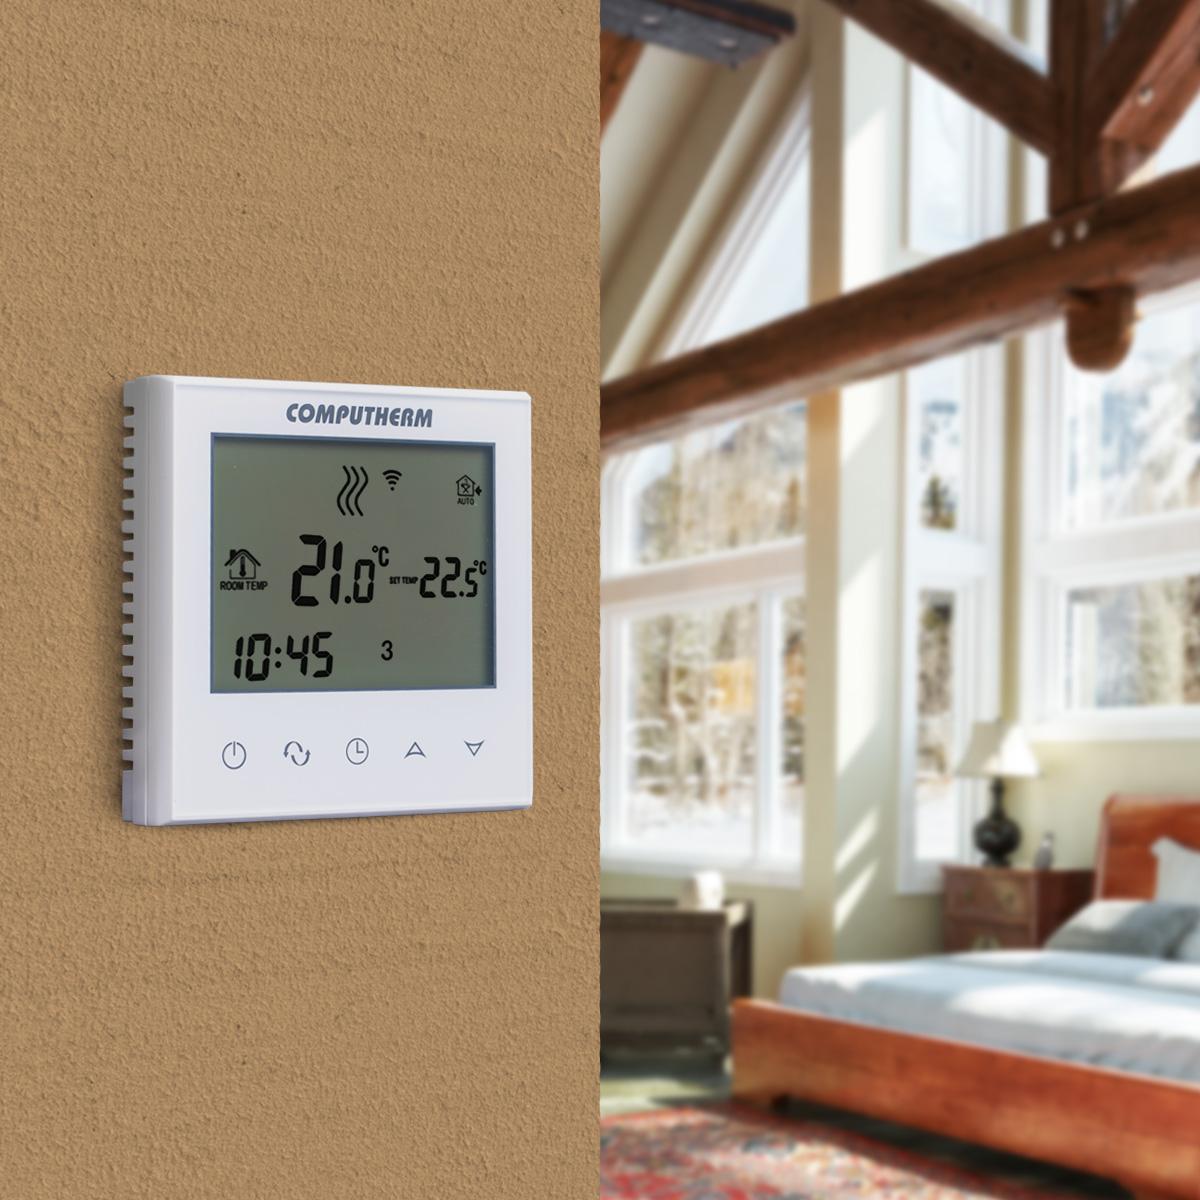 Computherm - Wi-fi termosztátok -  COMPUTHERM E280 - Quantrax Kft.